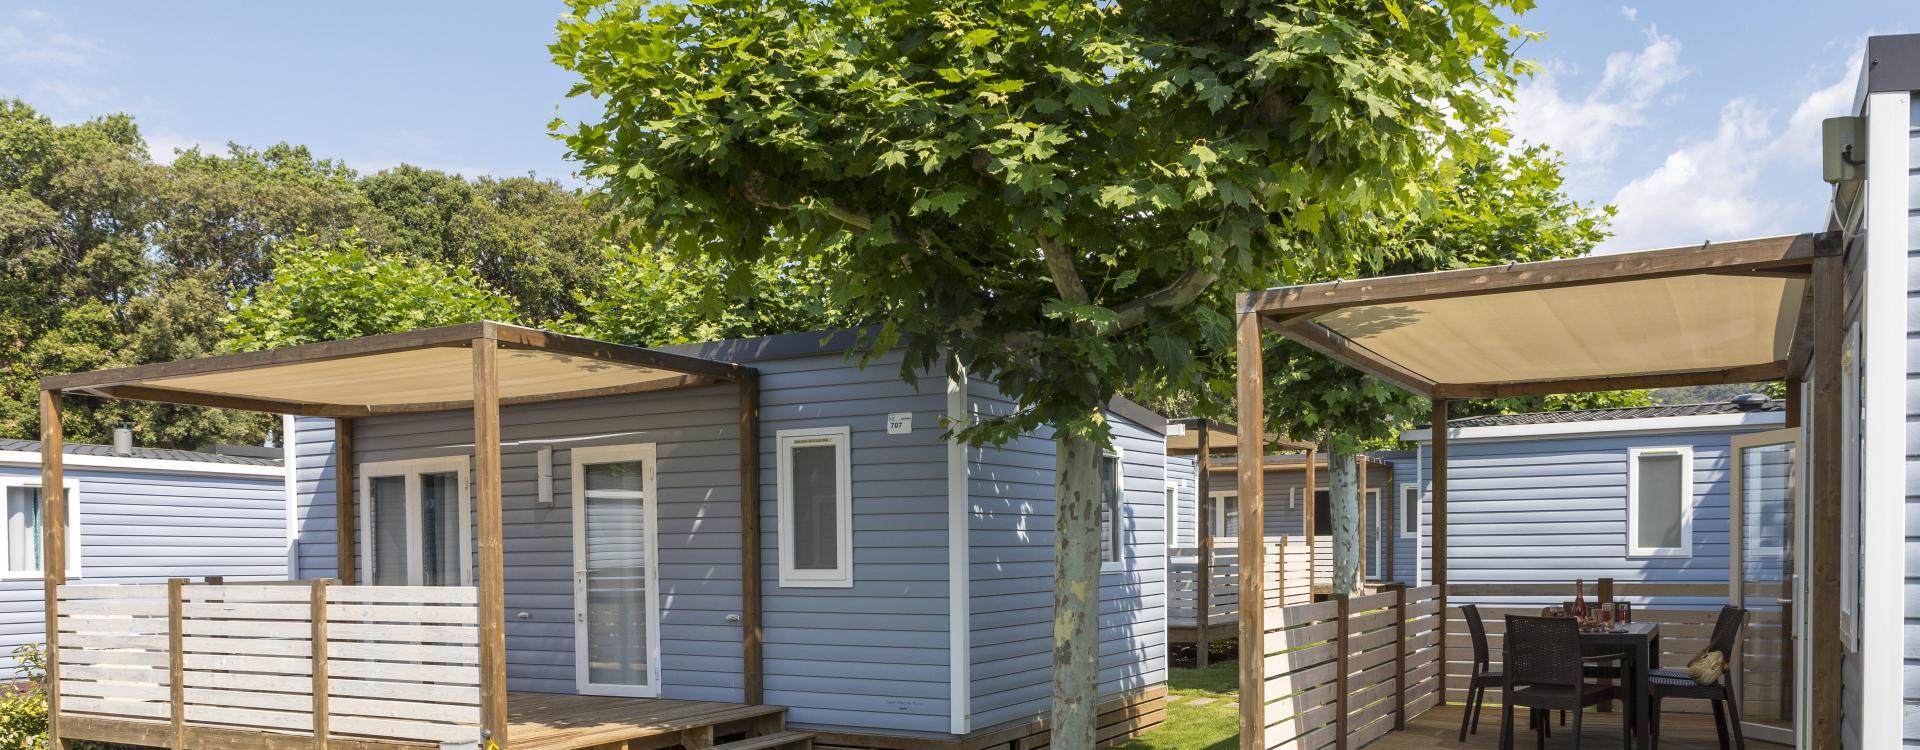 optimitzades/mobil-homes/emporda/recinto-mobil-home-emporda-camping-playa-aro.jpg